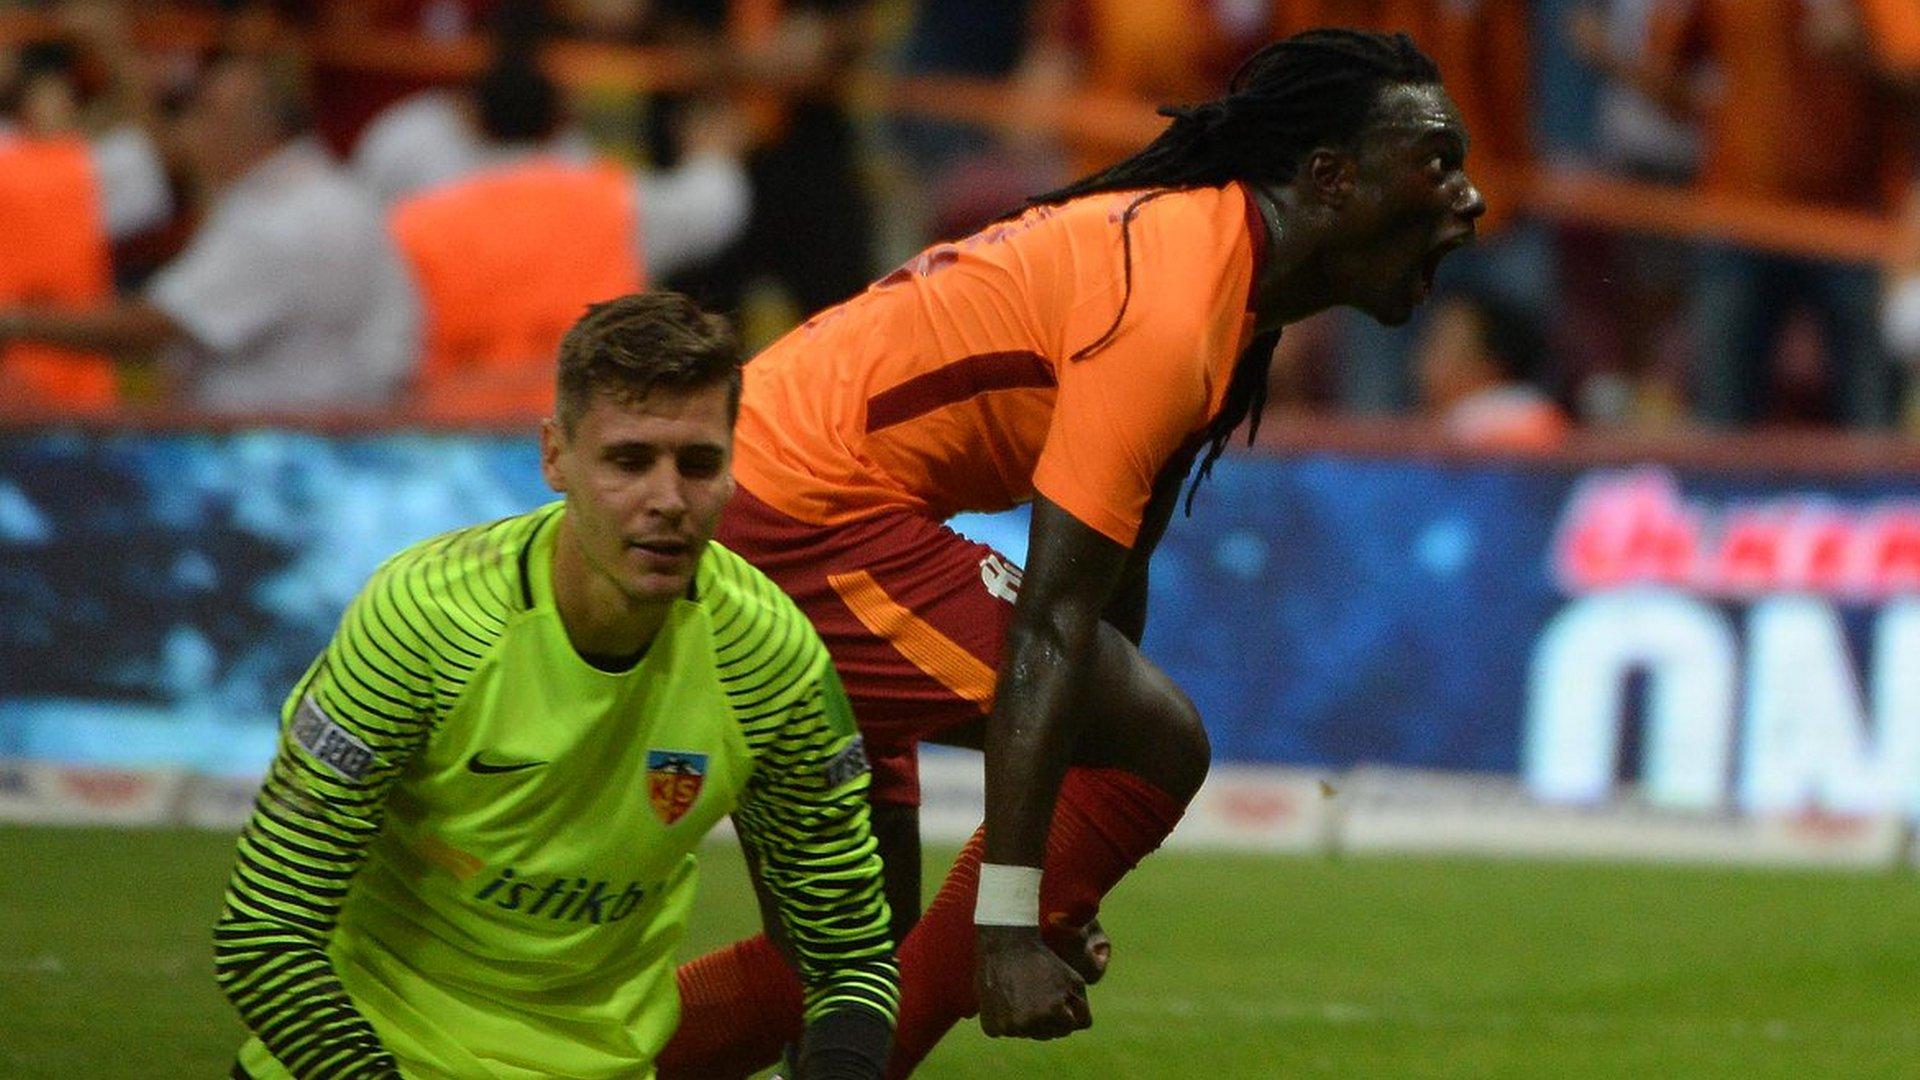 Galatasaray démarre fort avec Gomis et Belhanda — Super Lig